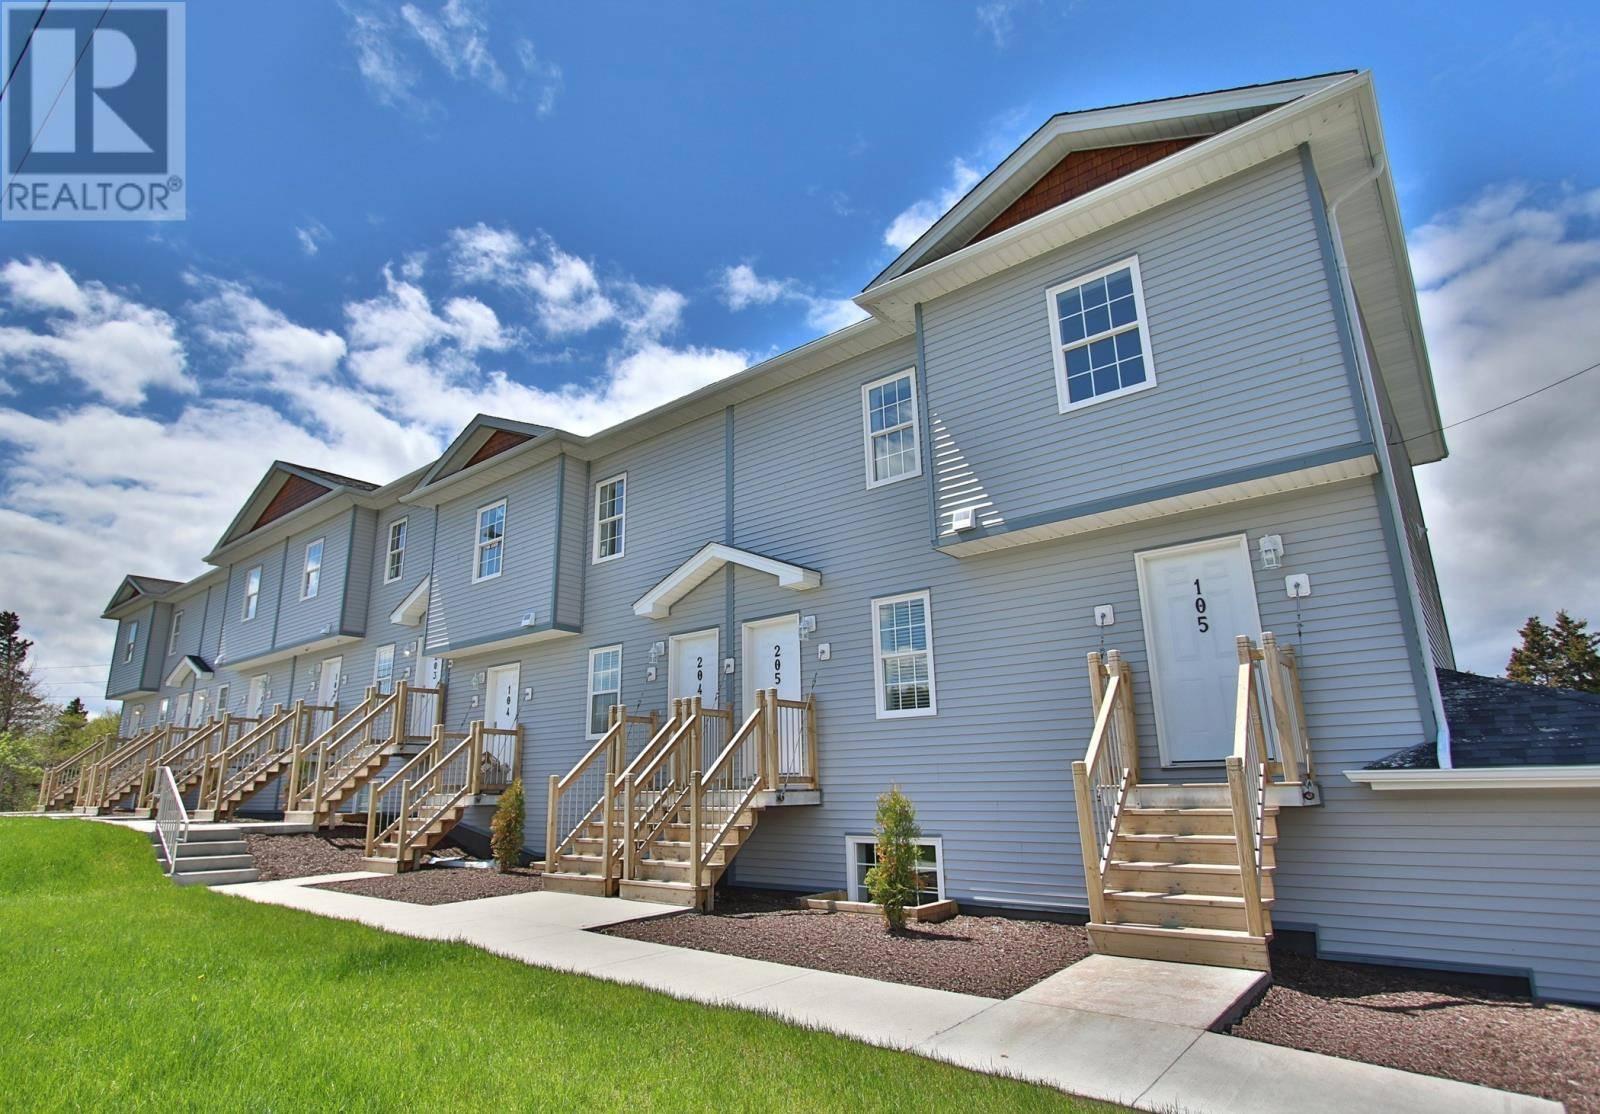 House for sale at 56 Bay Bulls Rd Unit 201 St. John's Newfoundland - MLS: 1200950